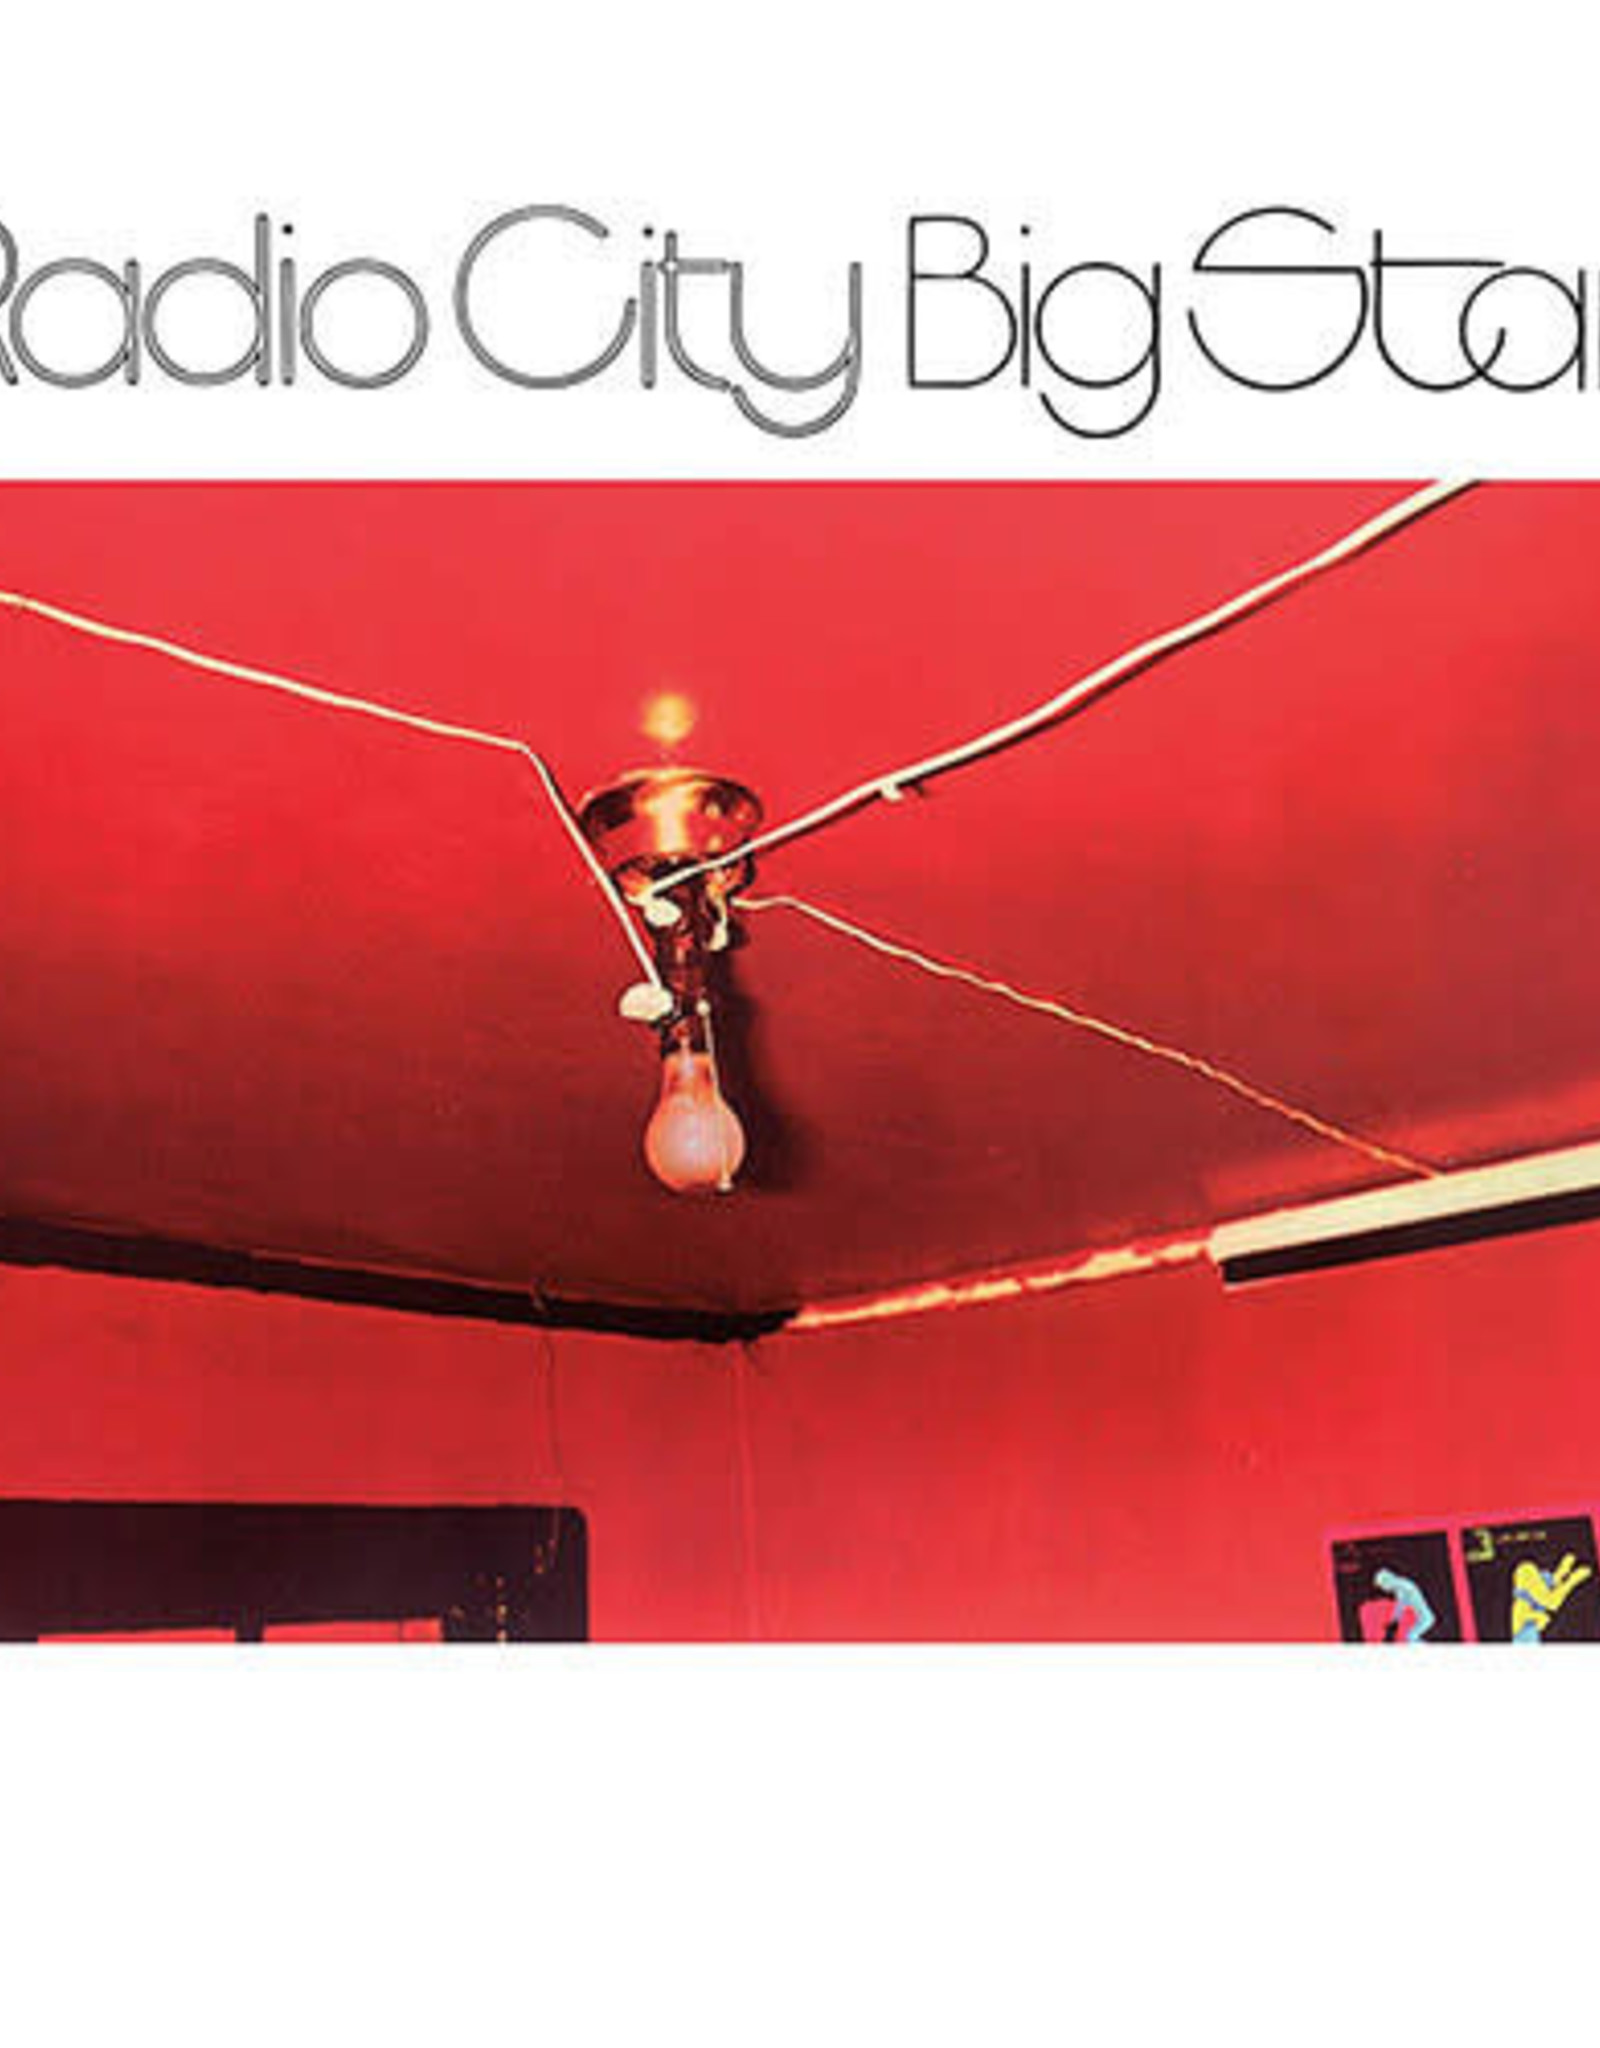 Big Star - Radio City (180 Gram)